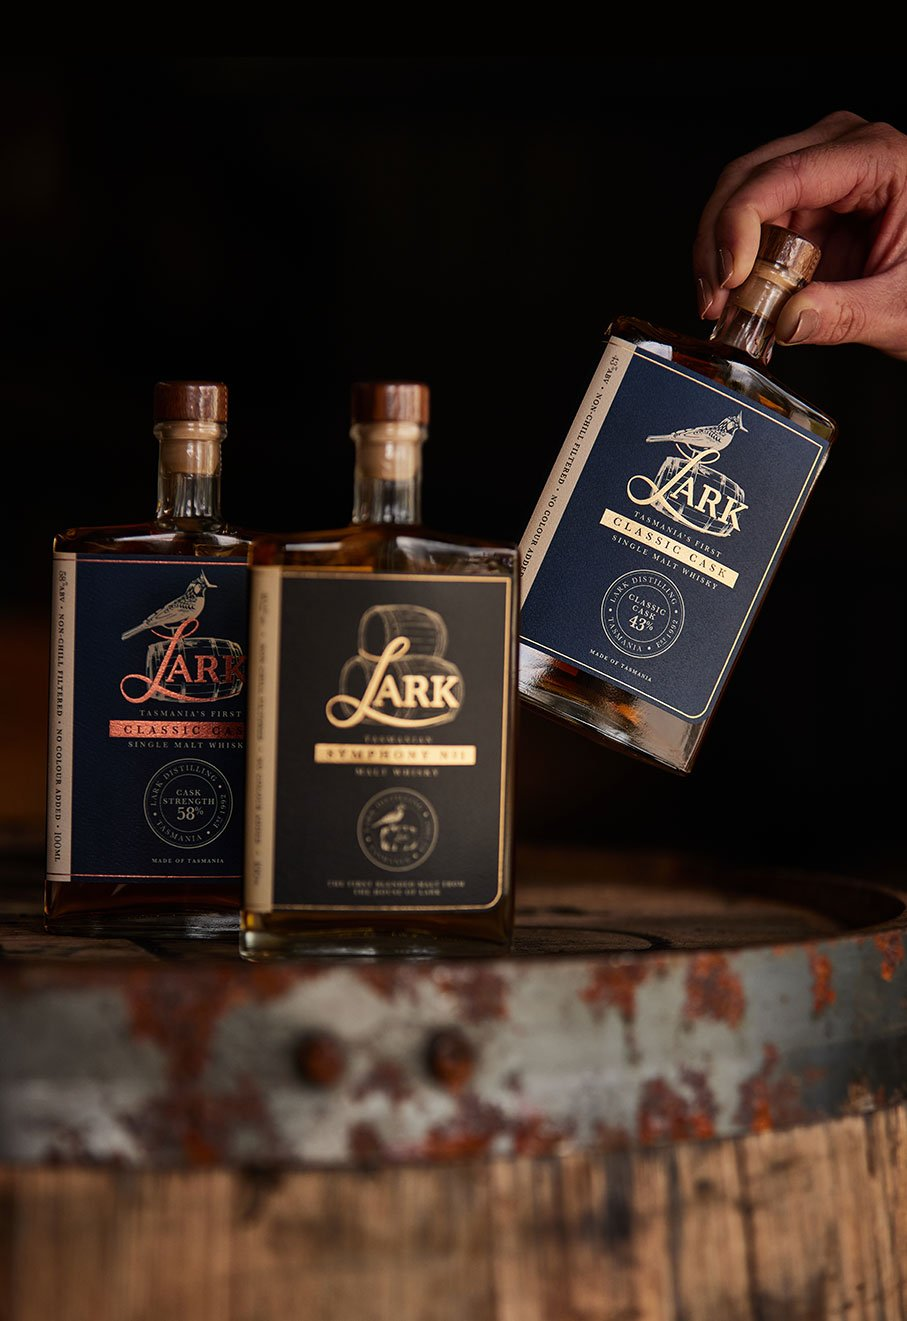 https://cdn.accentuate.io/6744765792417/1624512344441/whisky-tasting-set-collectable.jpg?v=0